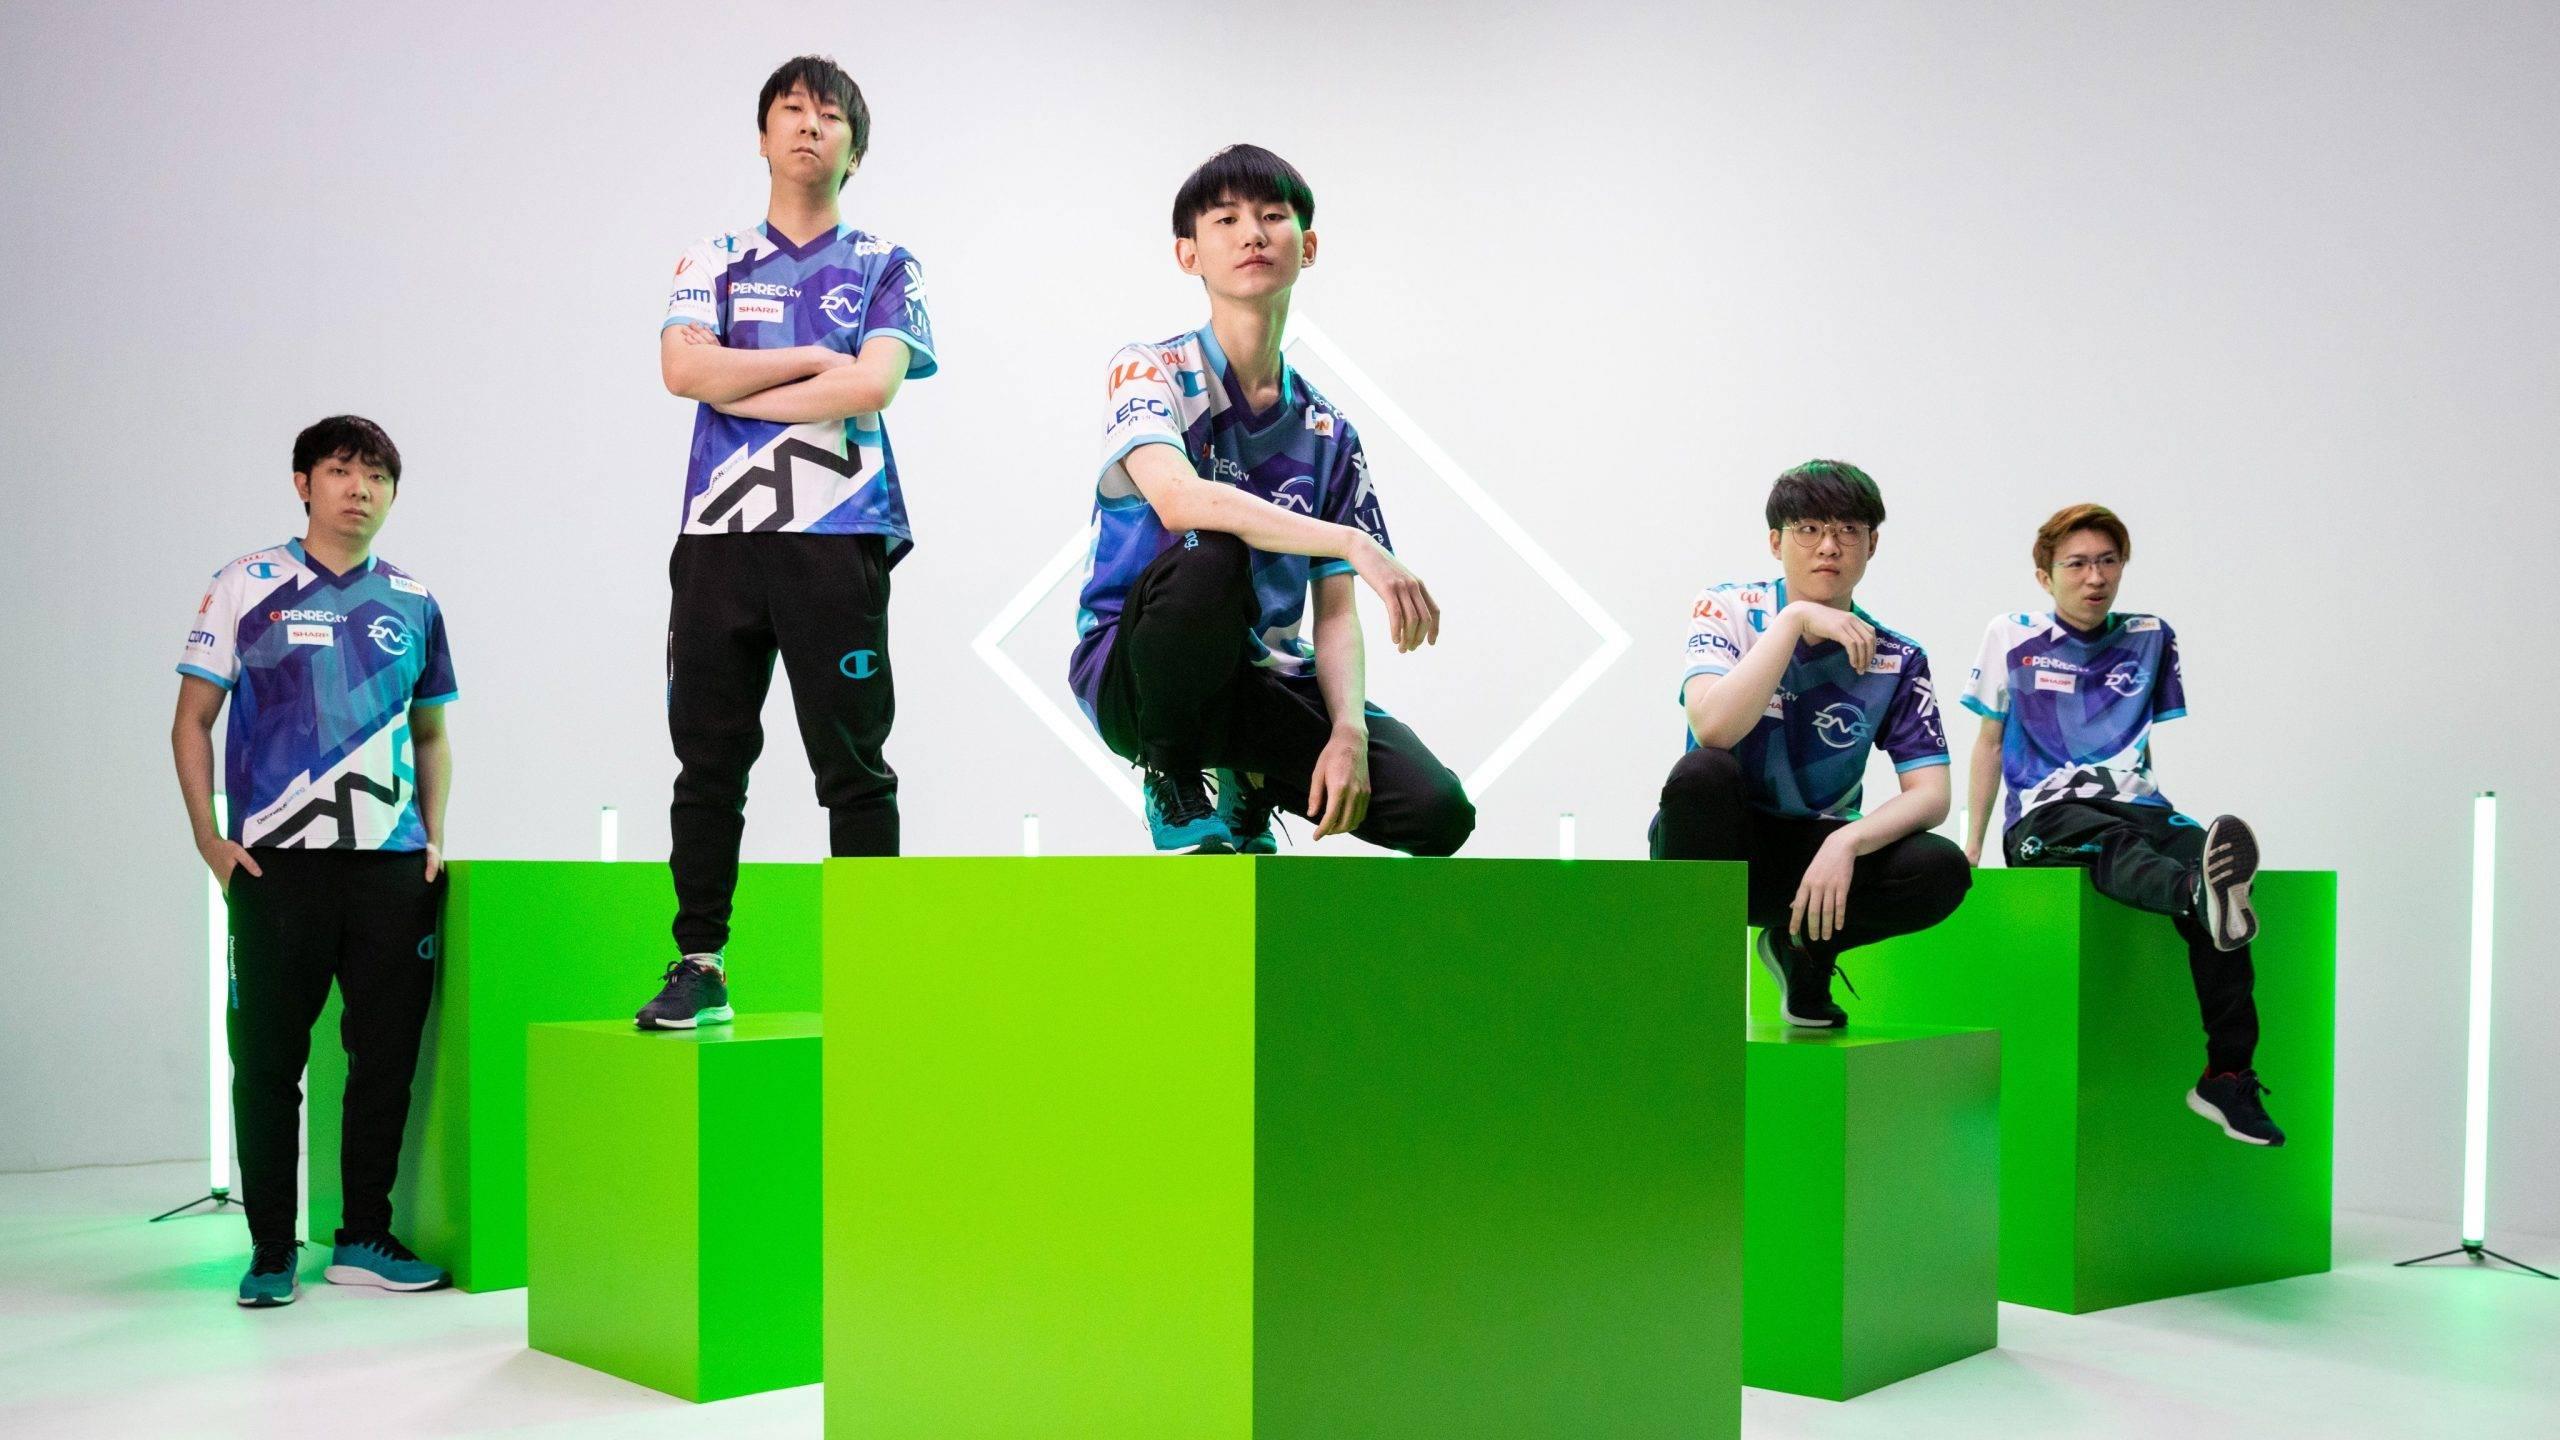 damwon team scaled